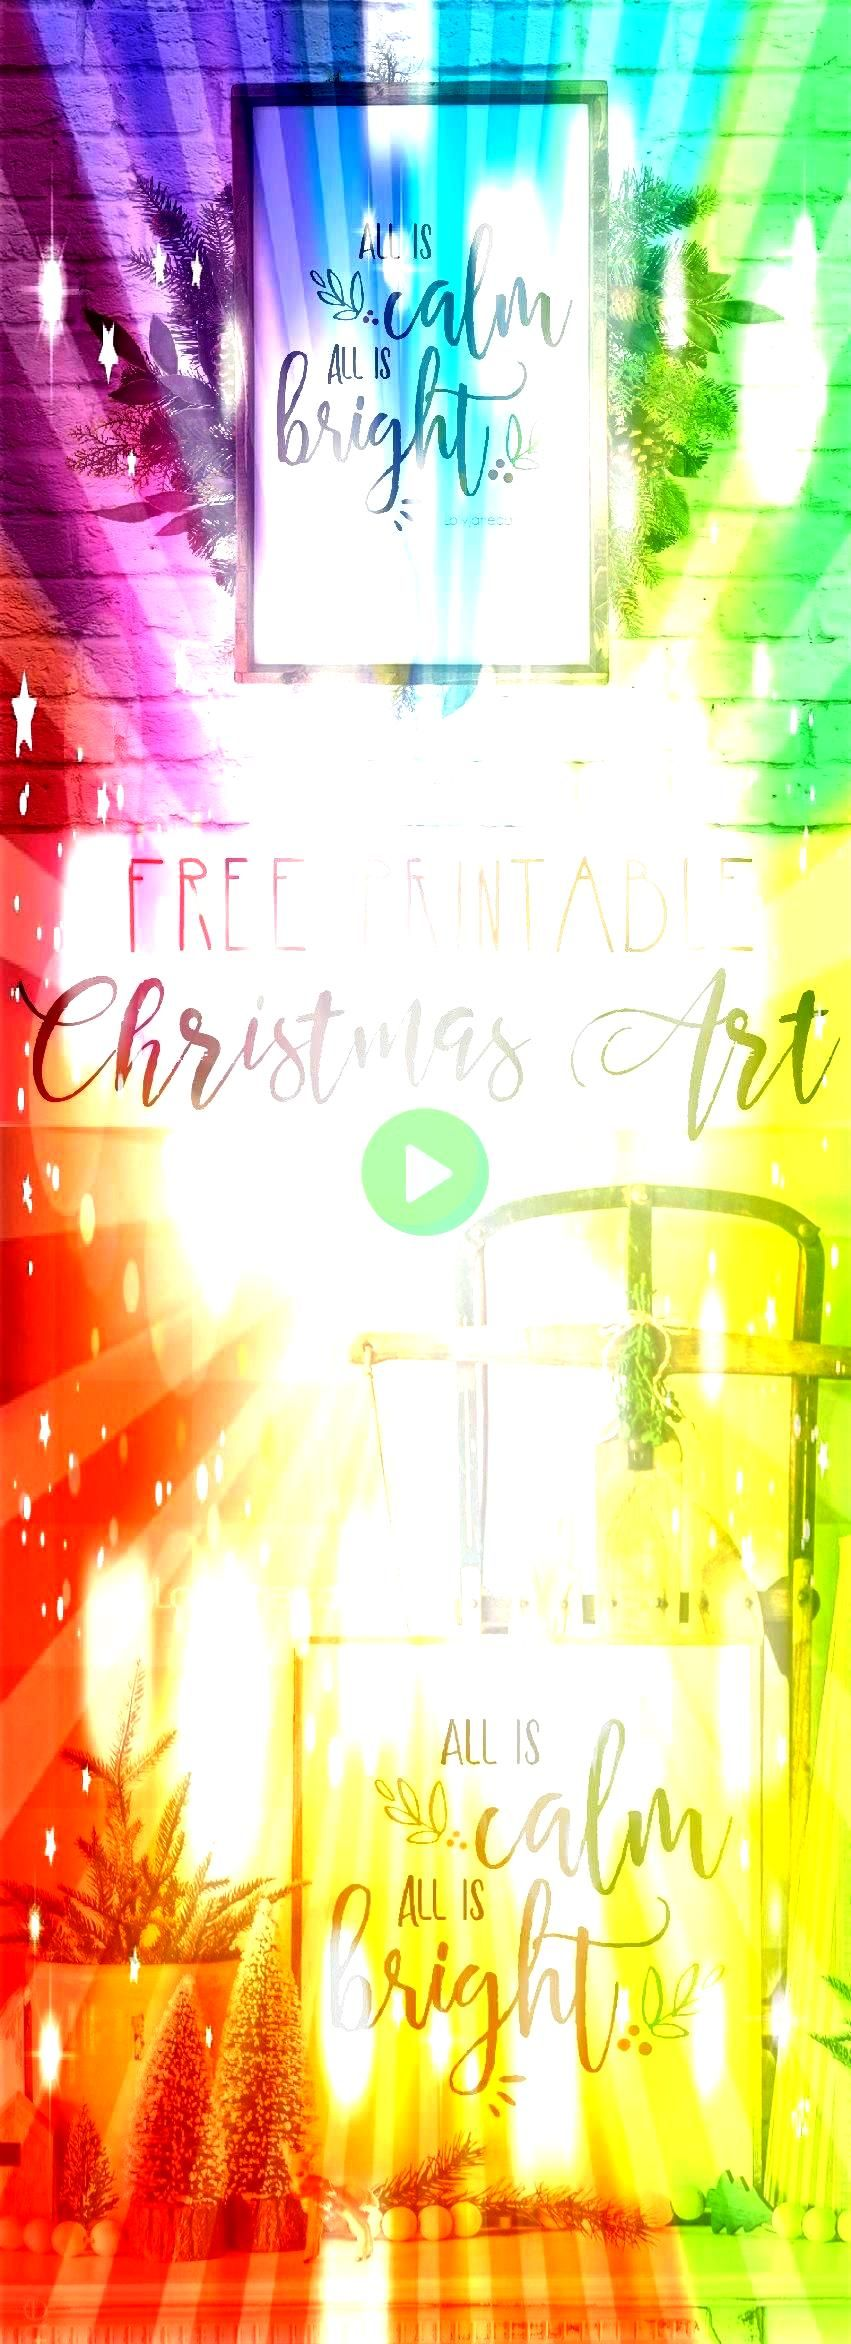 night christmas art  Love this pretty FREE Printable Christmas Art use as art a card invitation banner or to simpl free printable silent night christmas art  Love this pr...